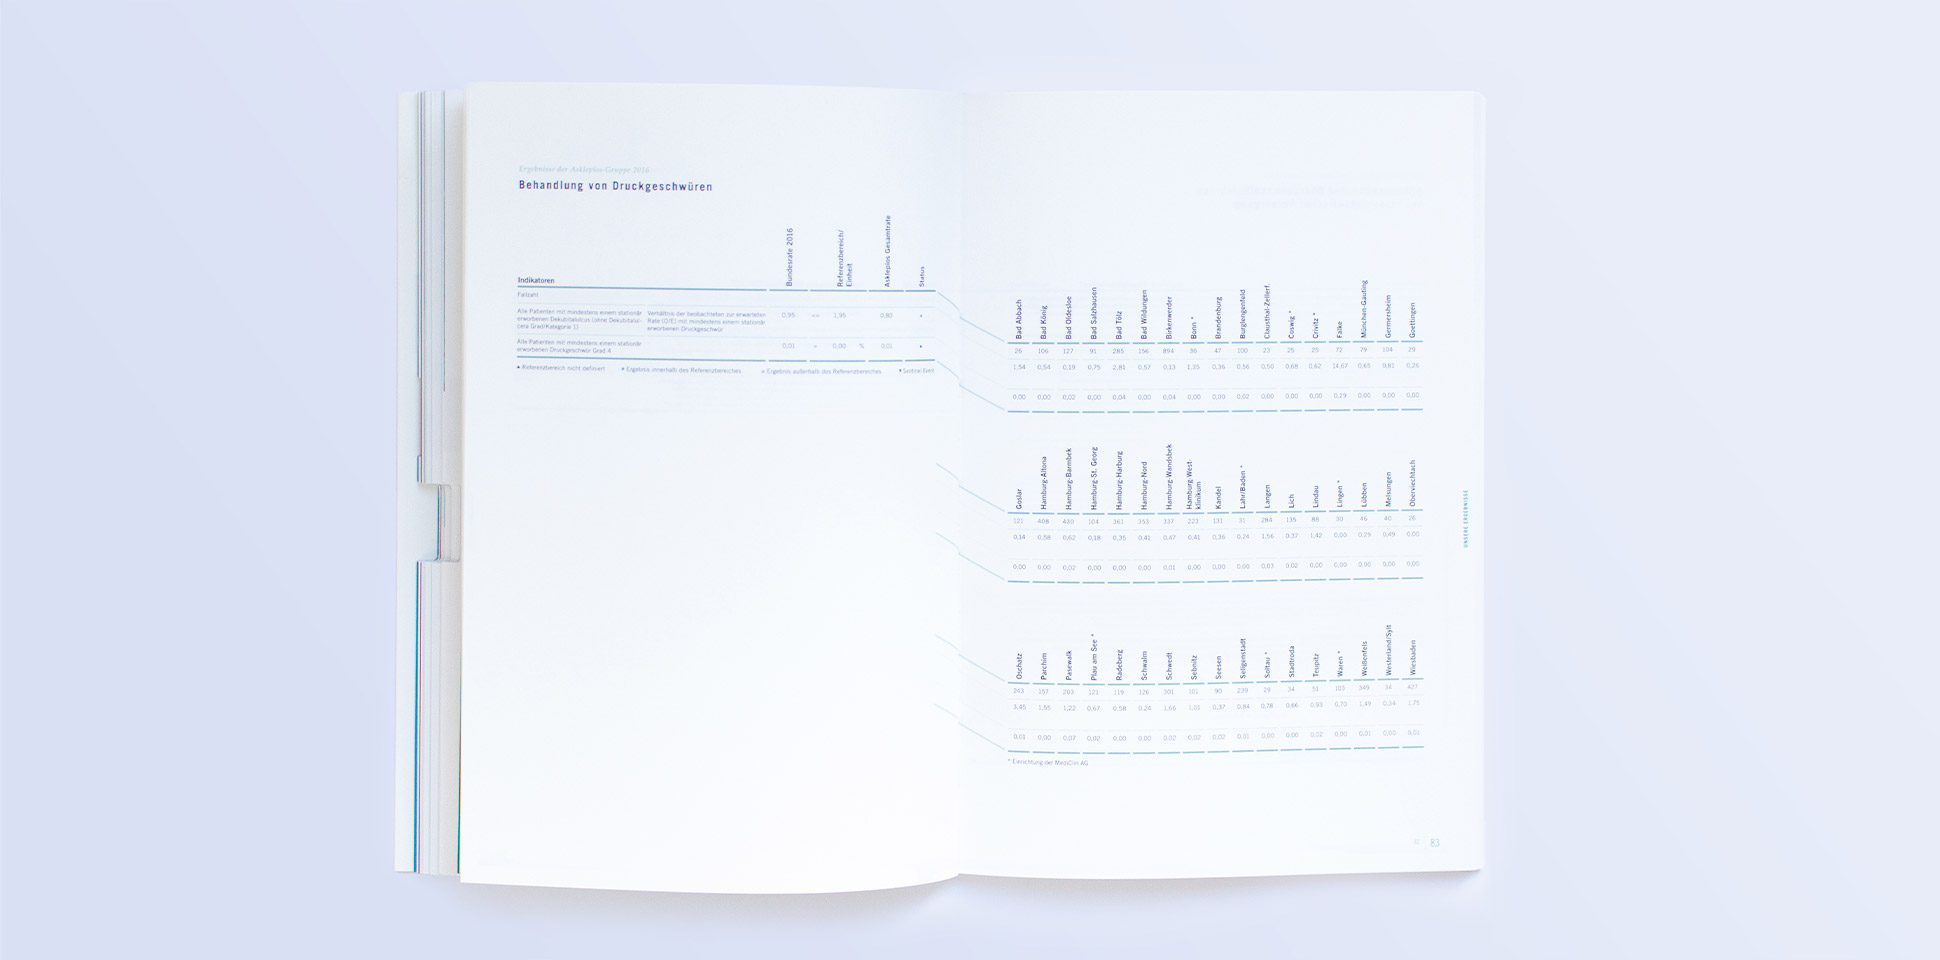 asklepios qualitaetsbericht doppelseite zahlen 2016 polarwerk